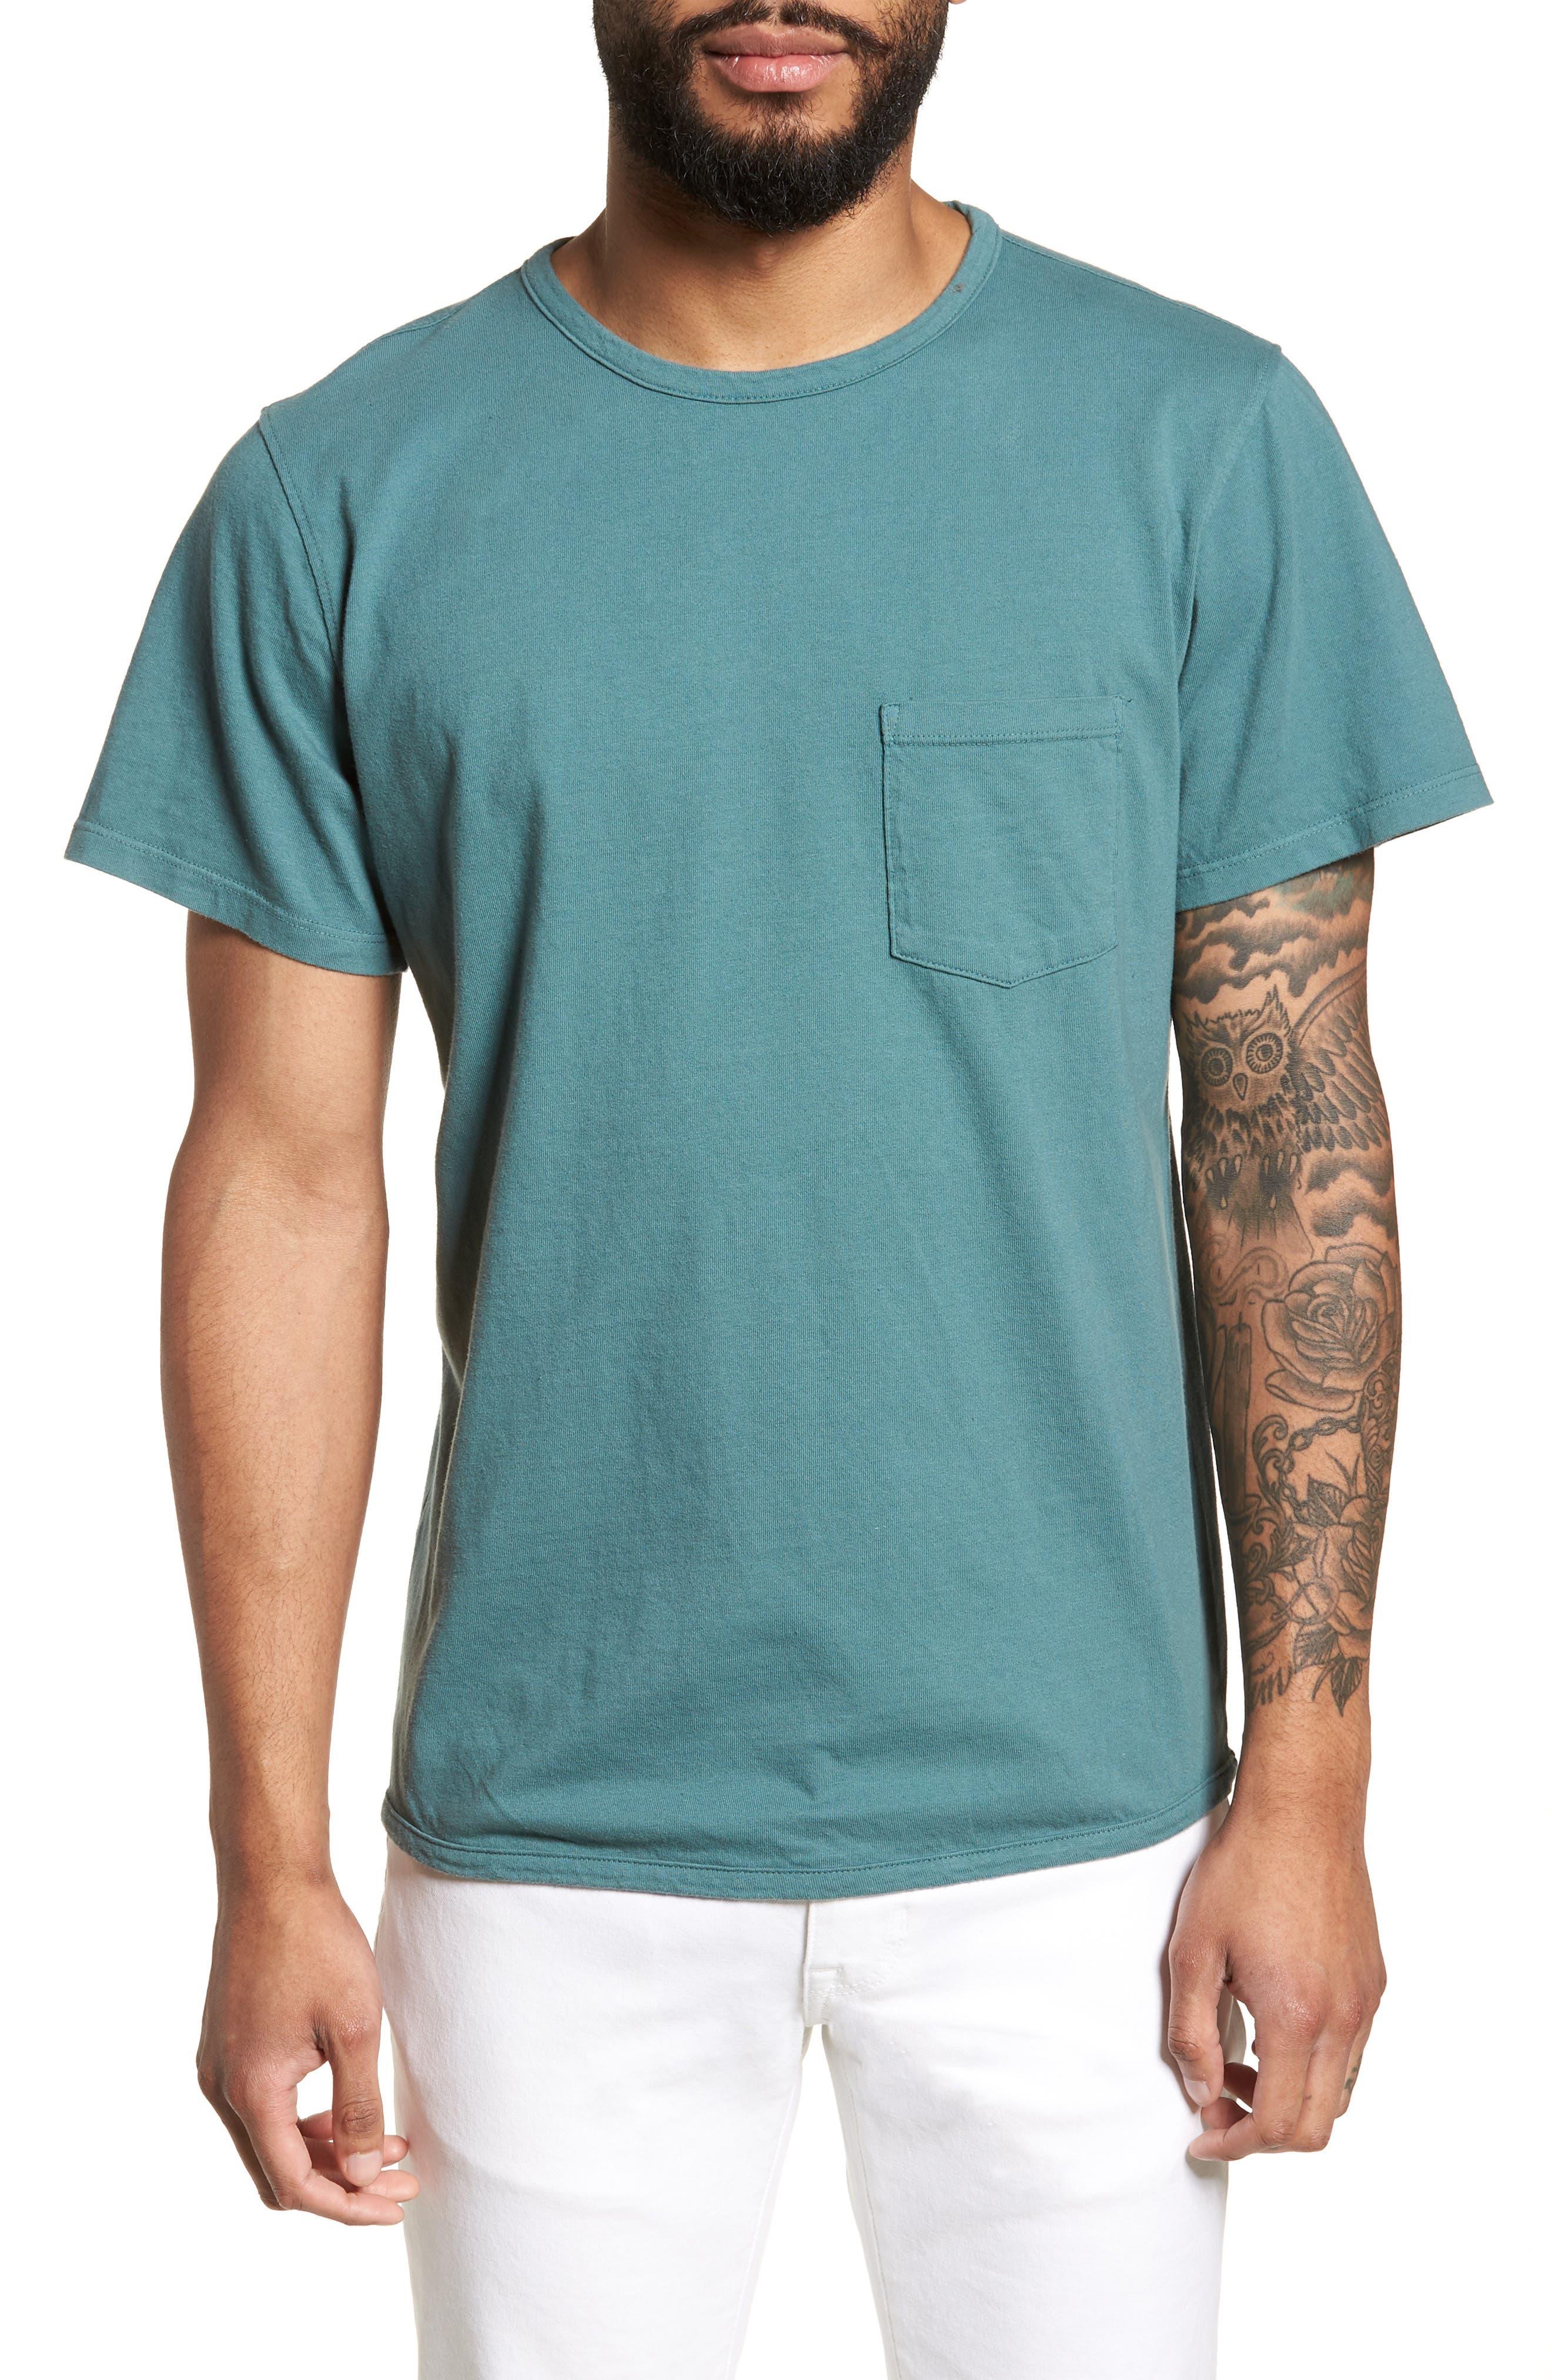 TWENTYMETRICTONS Pocket T-Shirt